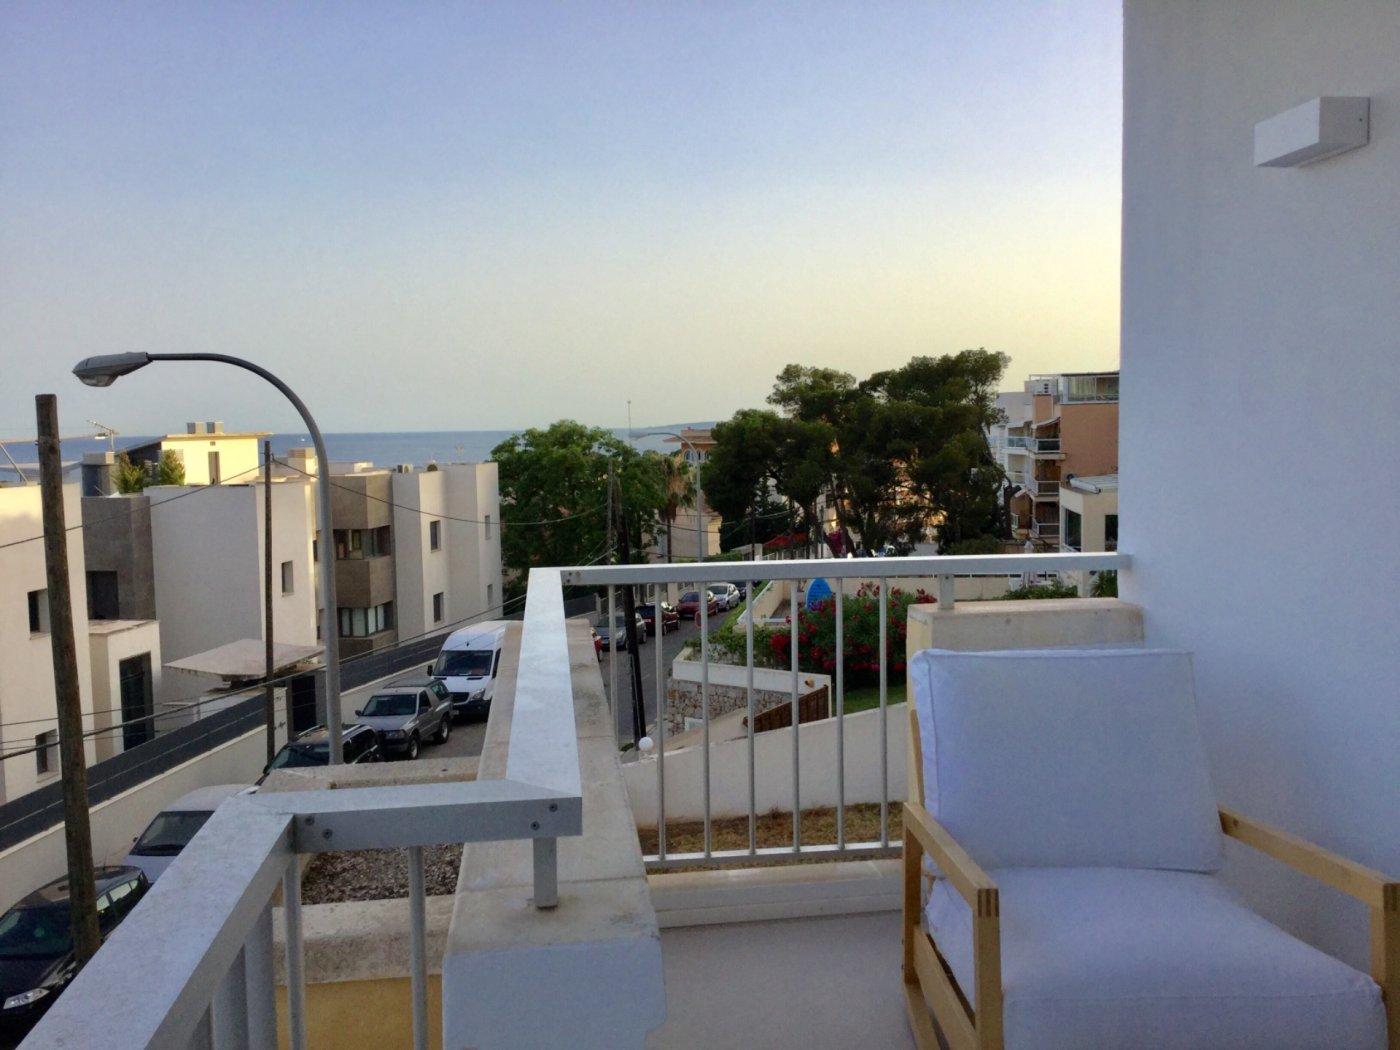 Lloguer Pis  Palma de mallorca ,la bonanova. La bonanova piso con vistas al mar, como a estrenar.